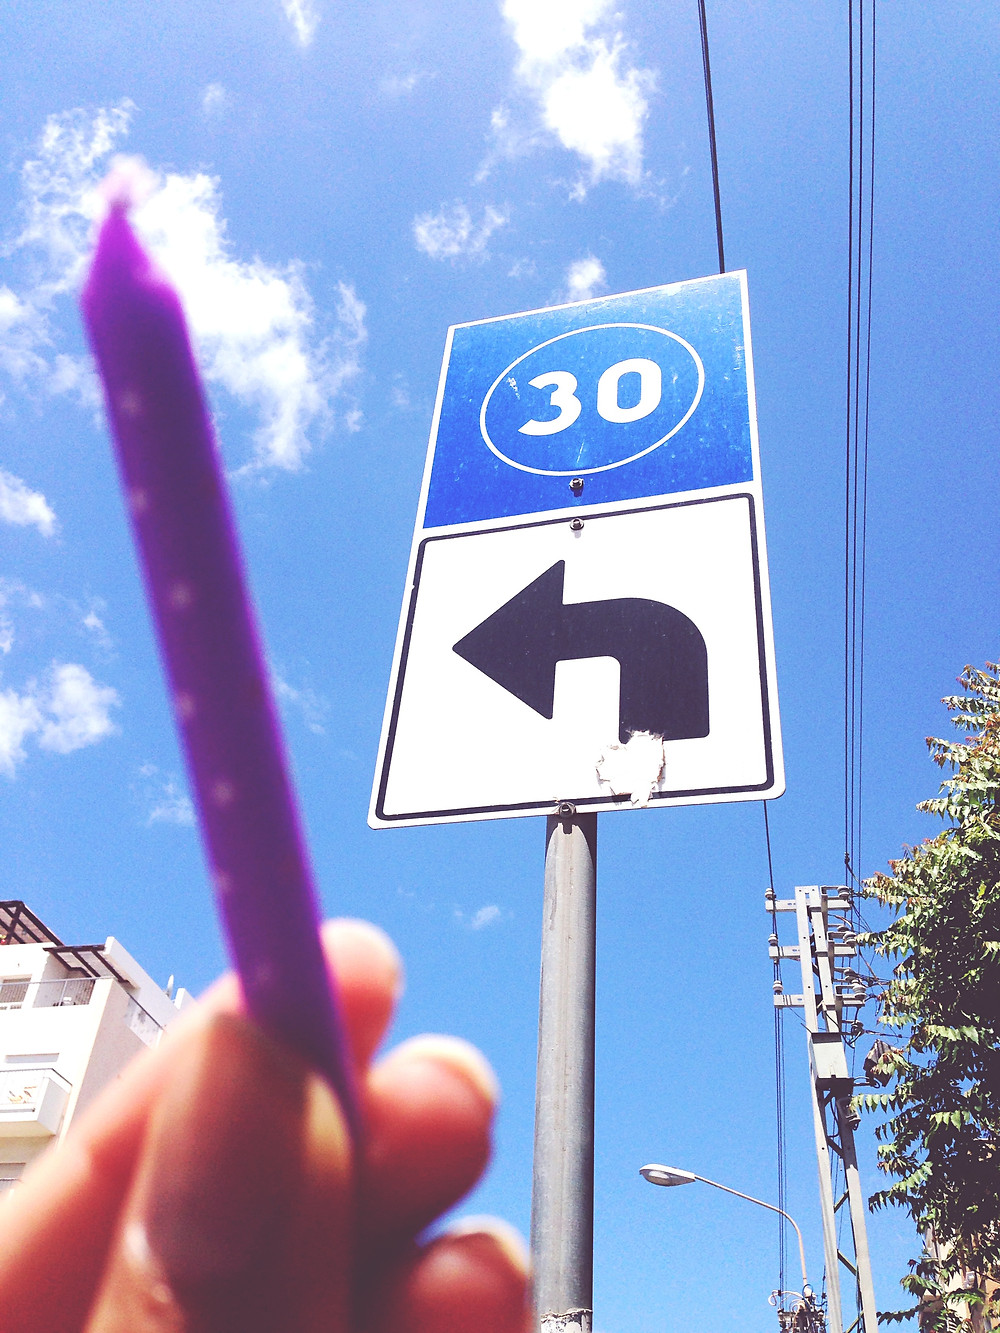 photo 5 (1).JPG